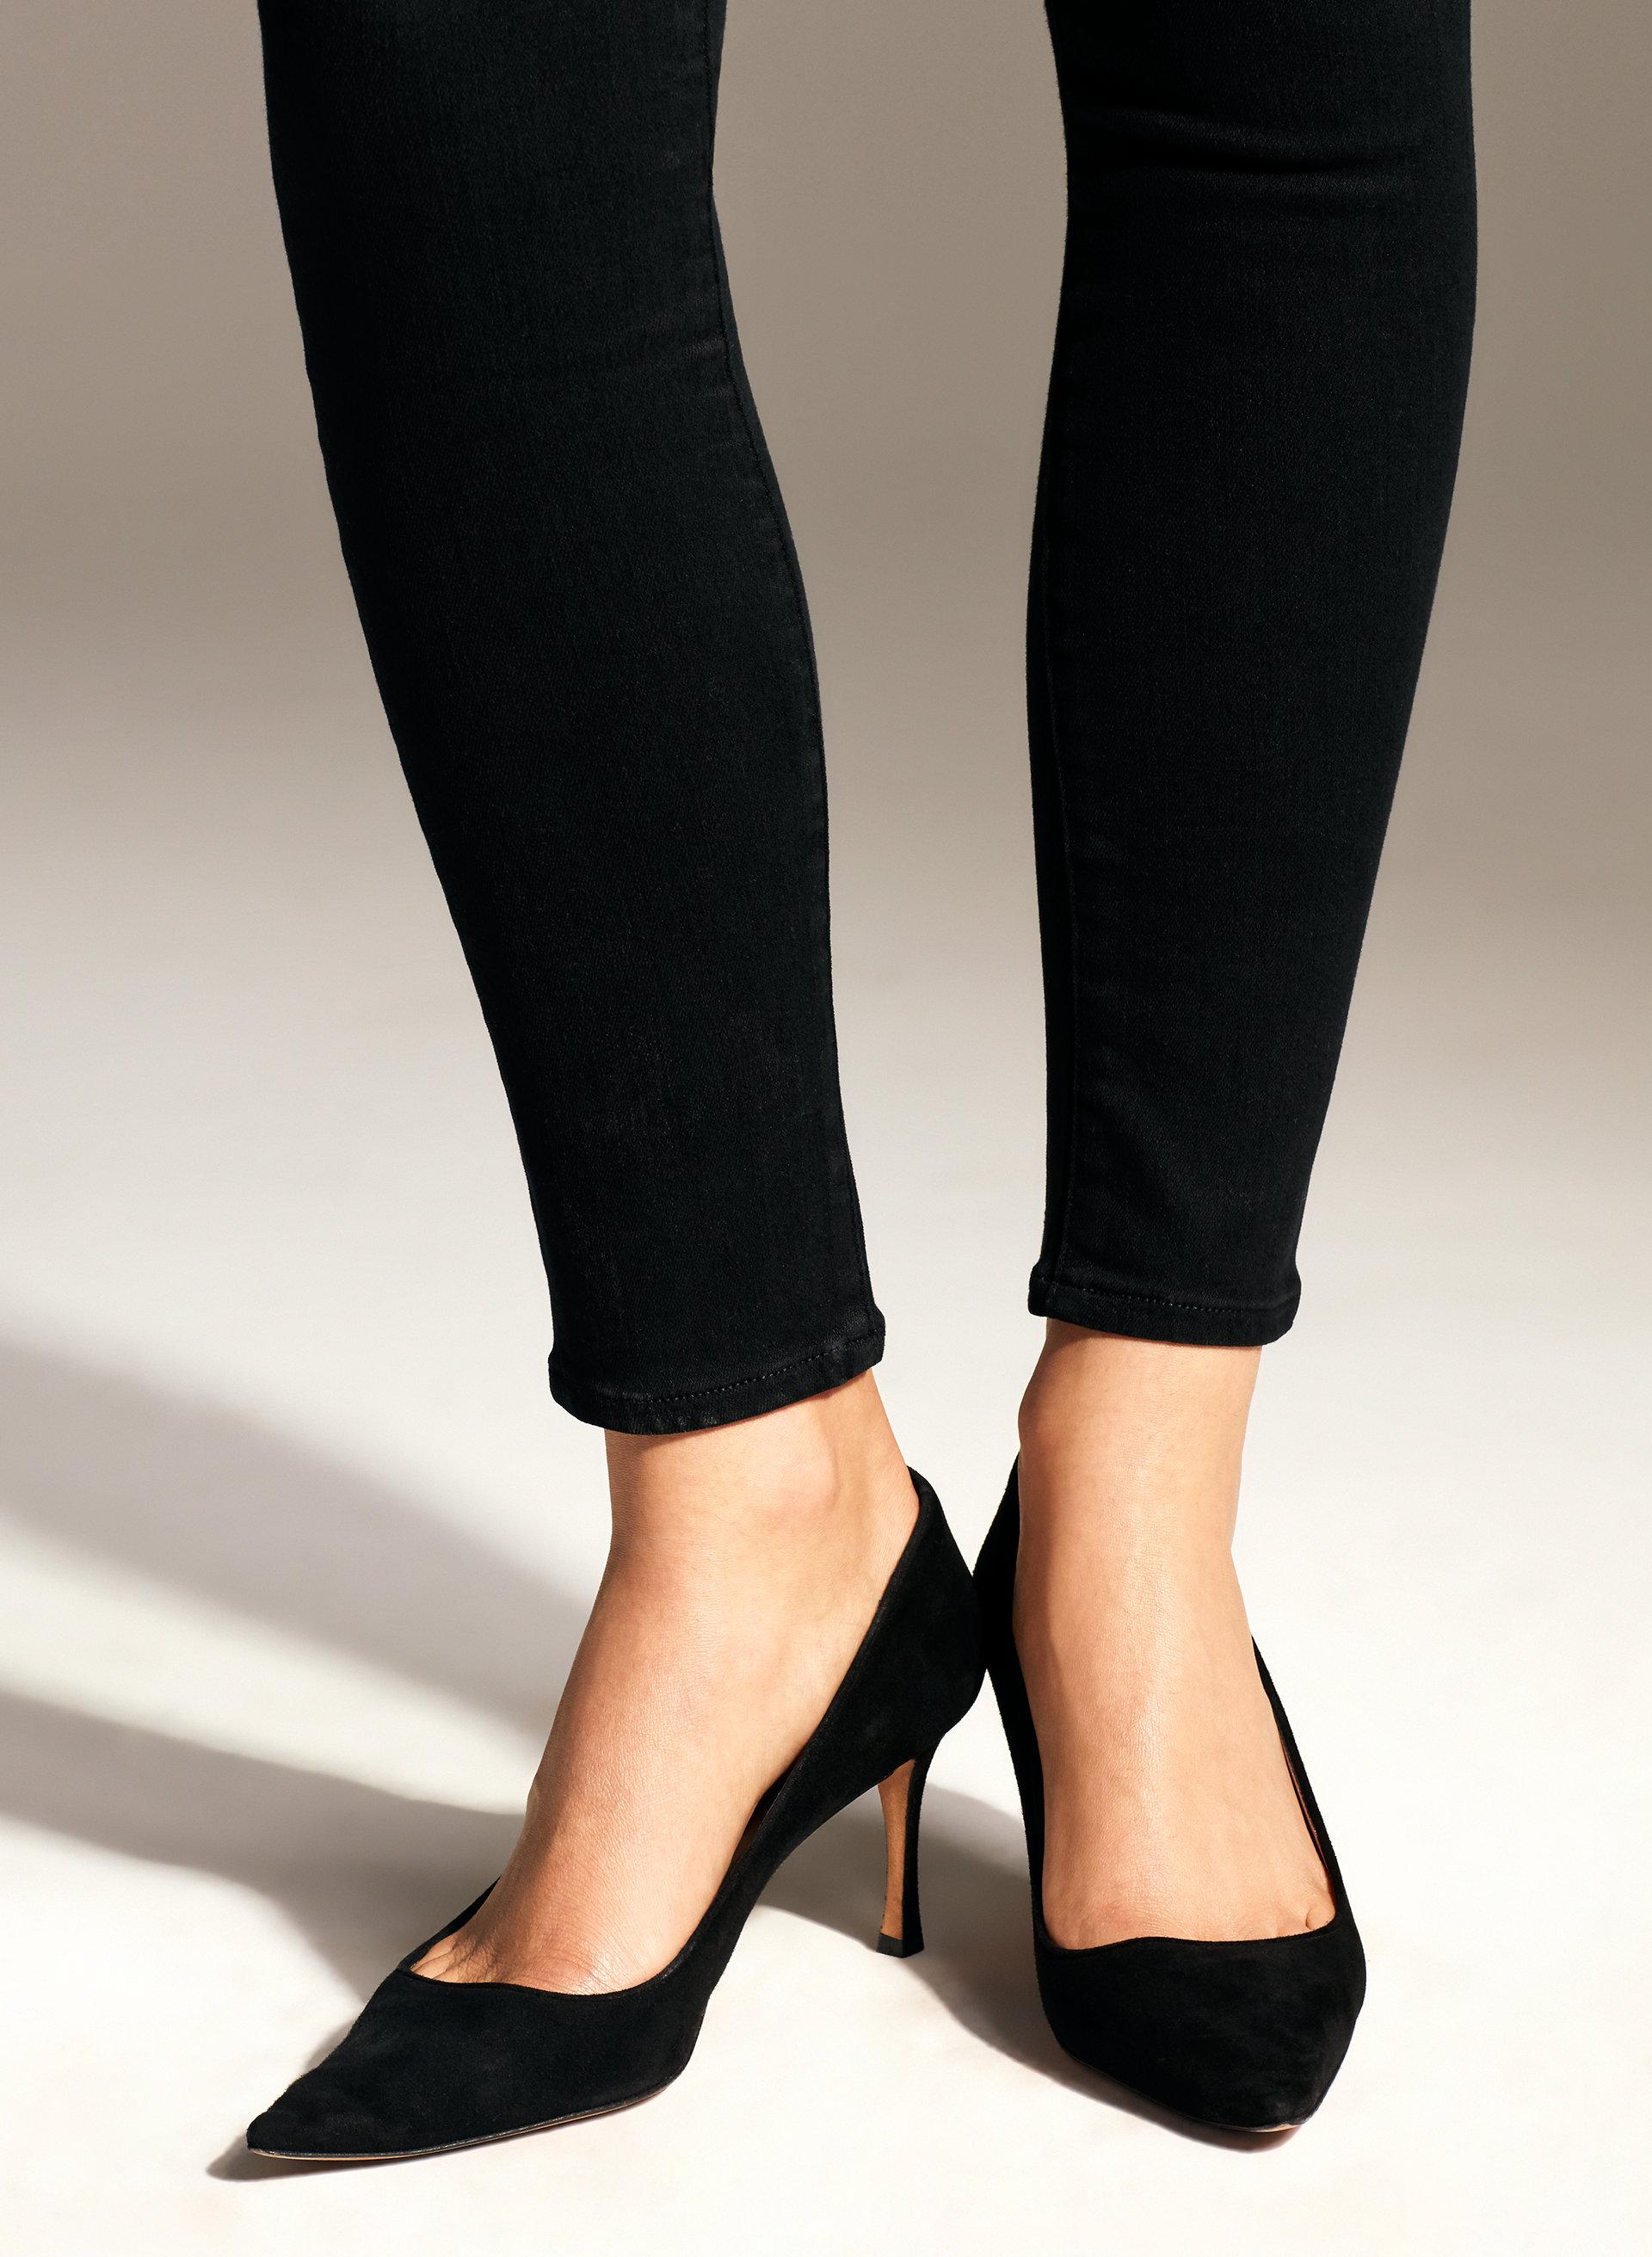 carwithdgerca: High heels forum